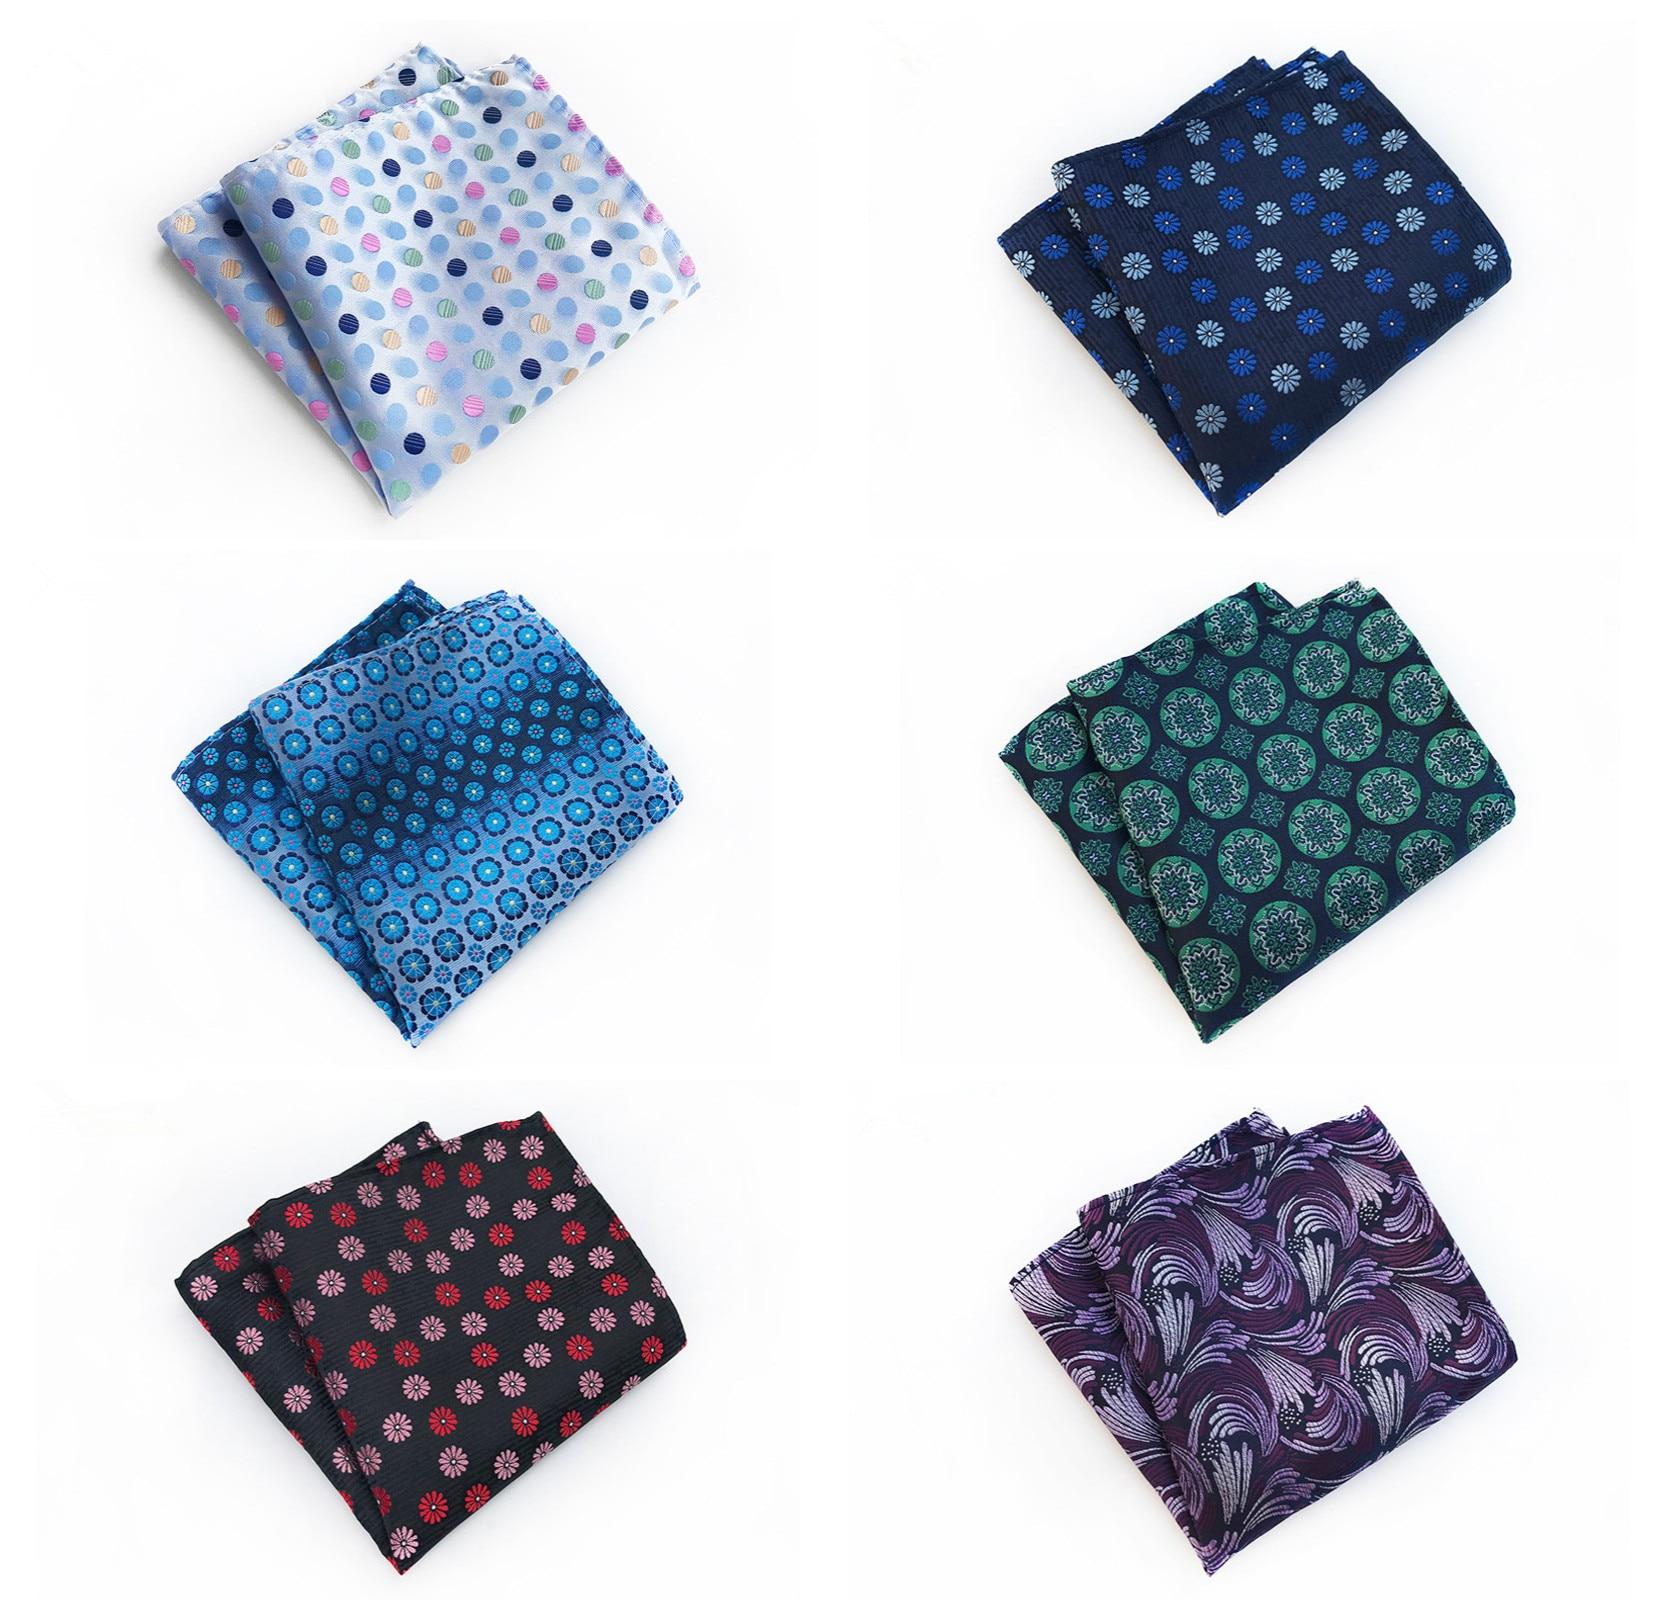 Men's Business Party Dresses Decorative Pocket Towels 2020 Fashion New Polyester Material Fashion Floral Set Pocket Towel